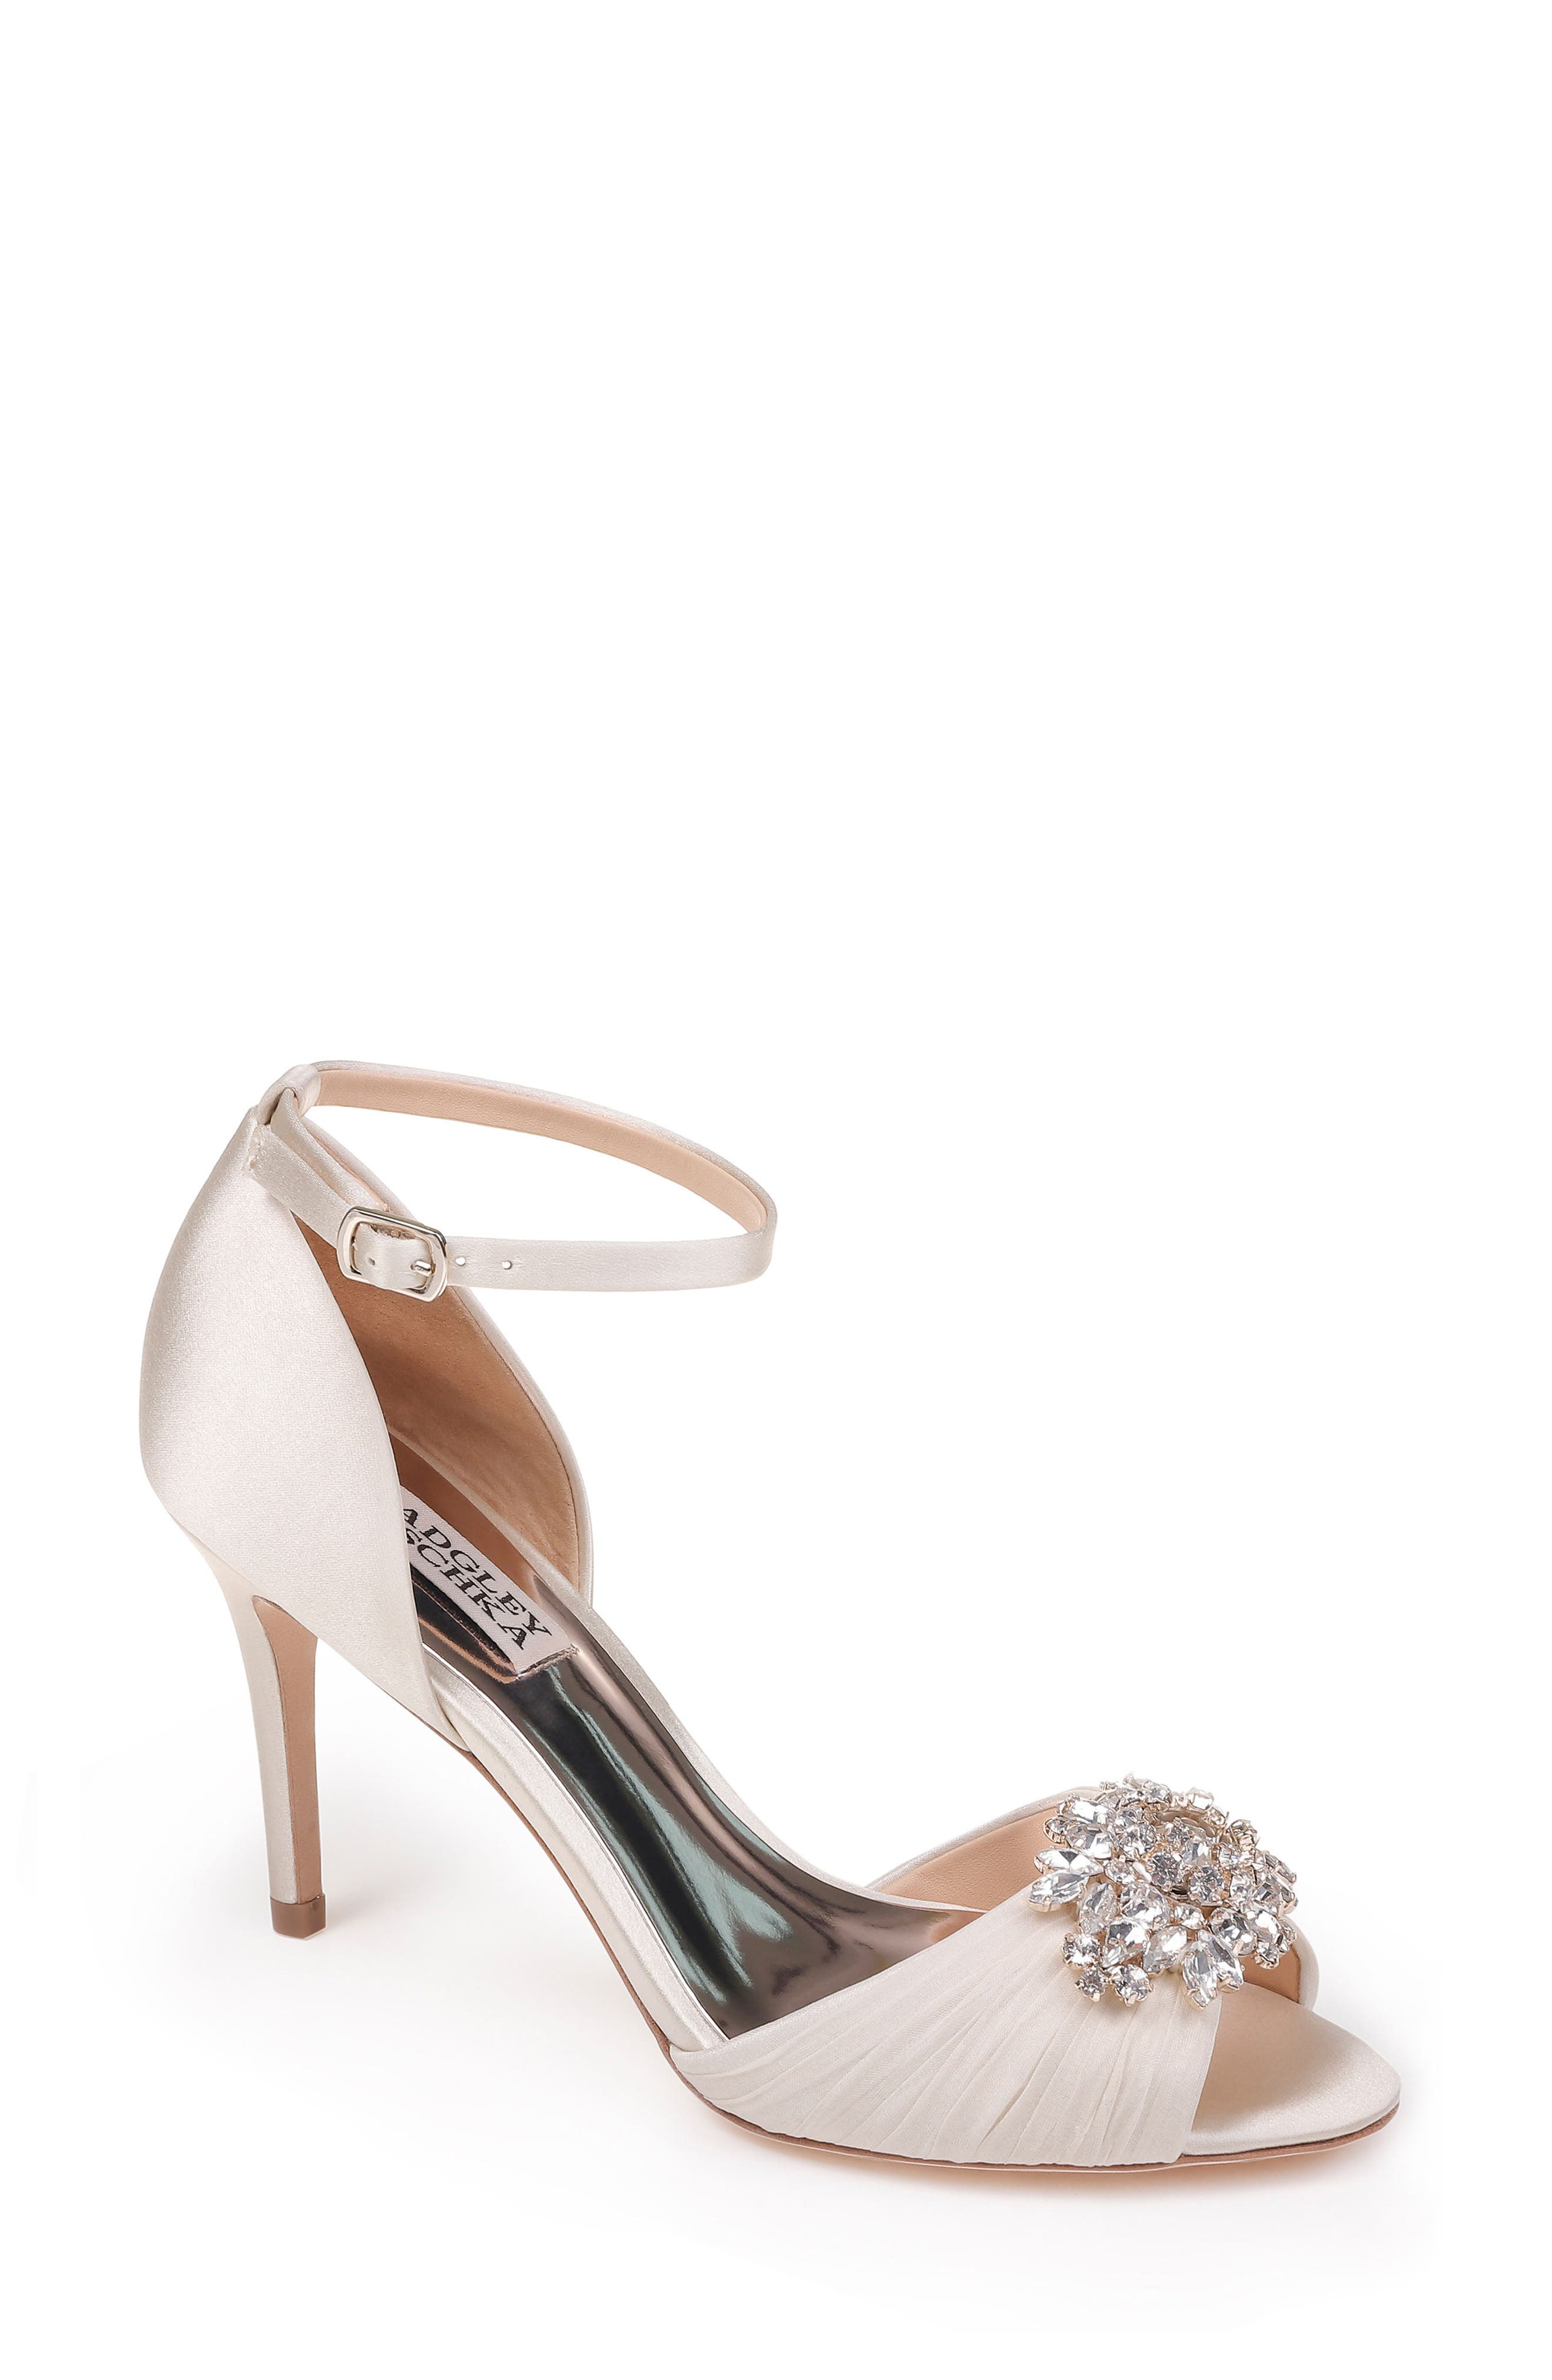 Sabrina Ankle Strap Sandal,                         Main,                         color, Ivory Satin